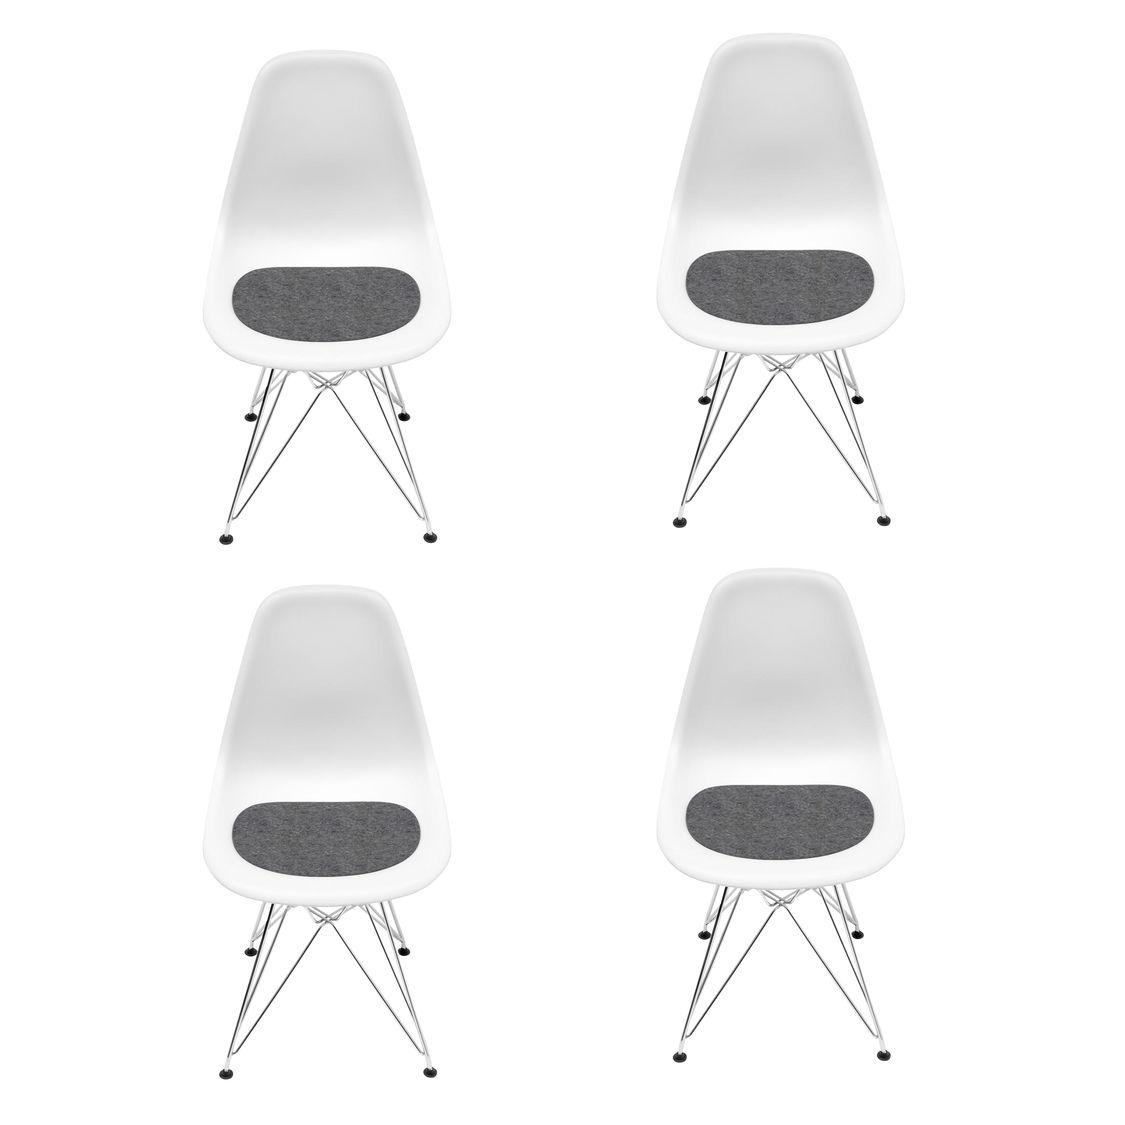 Eames dsr chair kit de promotion 4 chaises vitra for Chaise facon eames